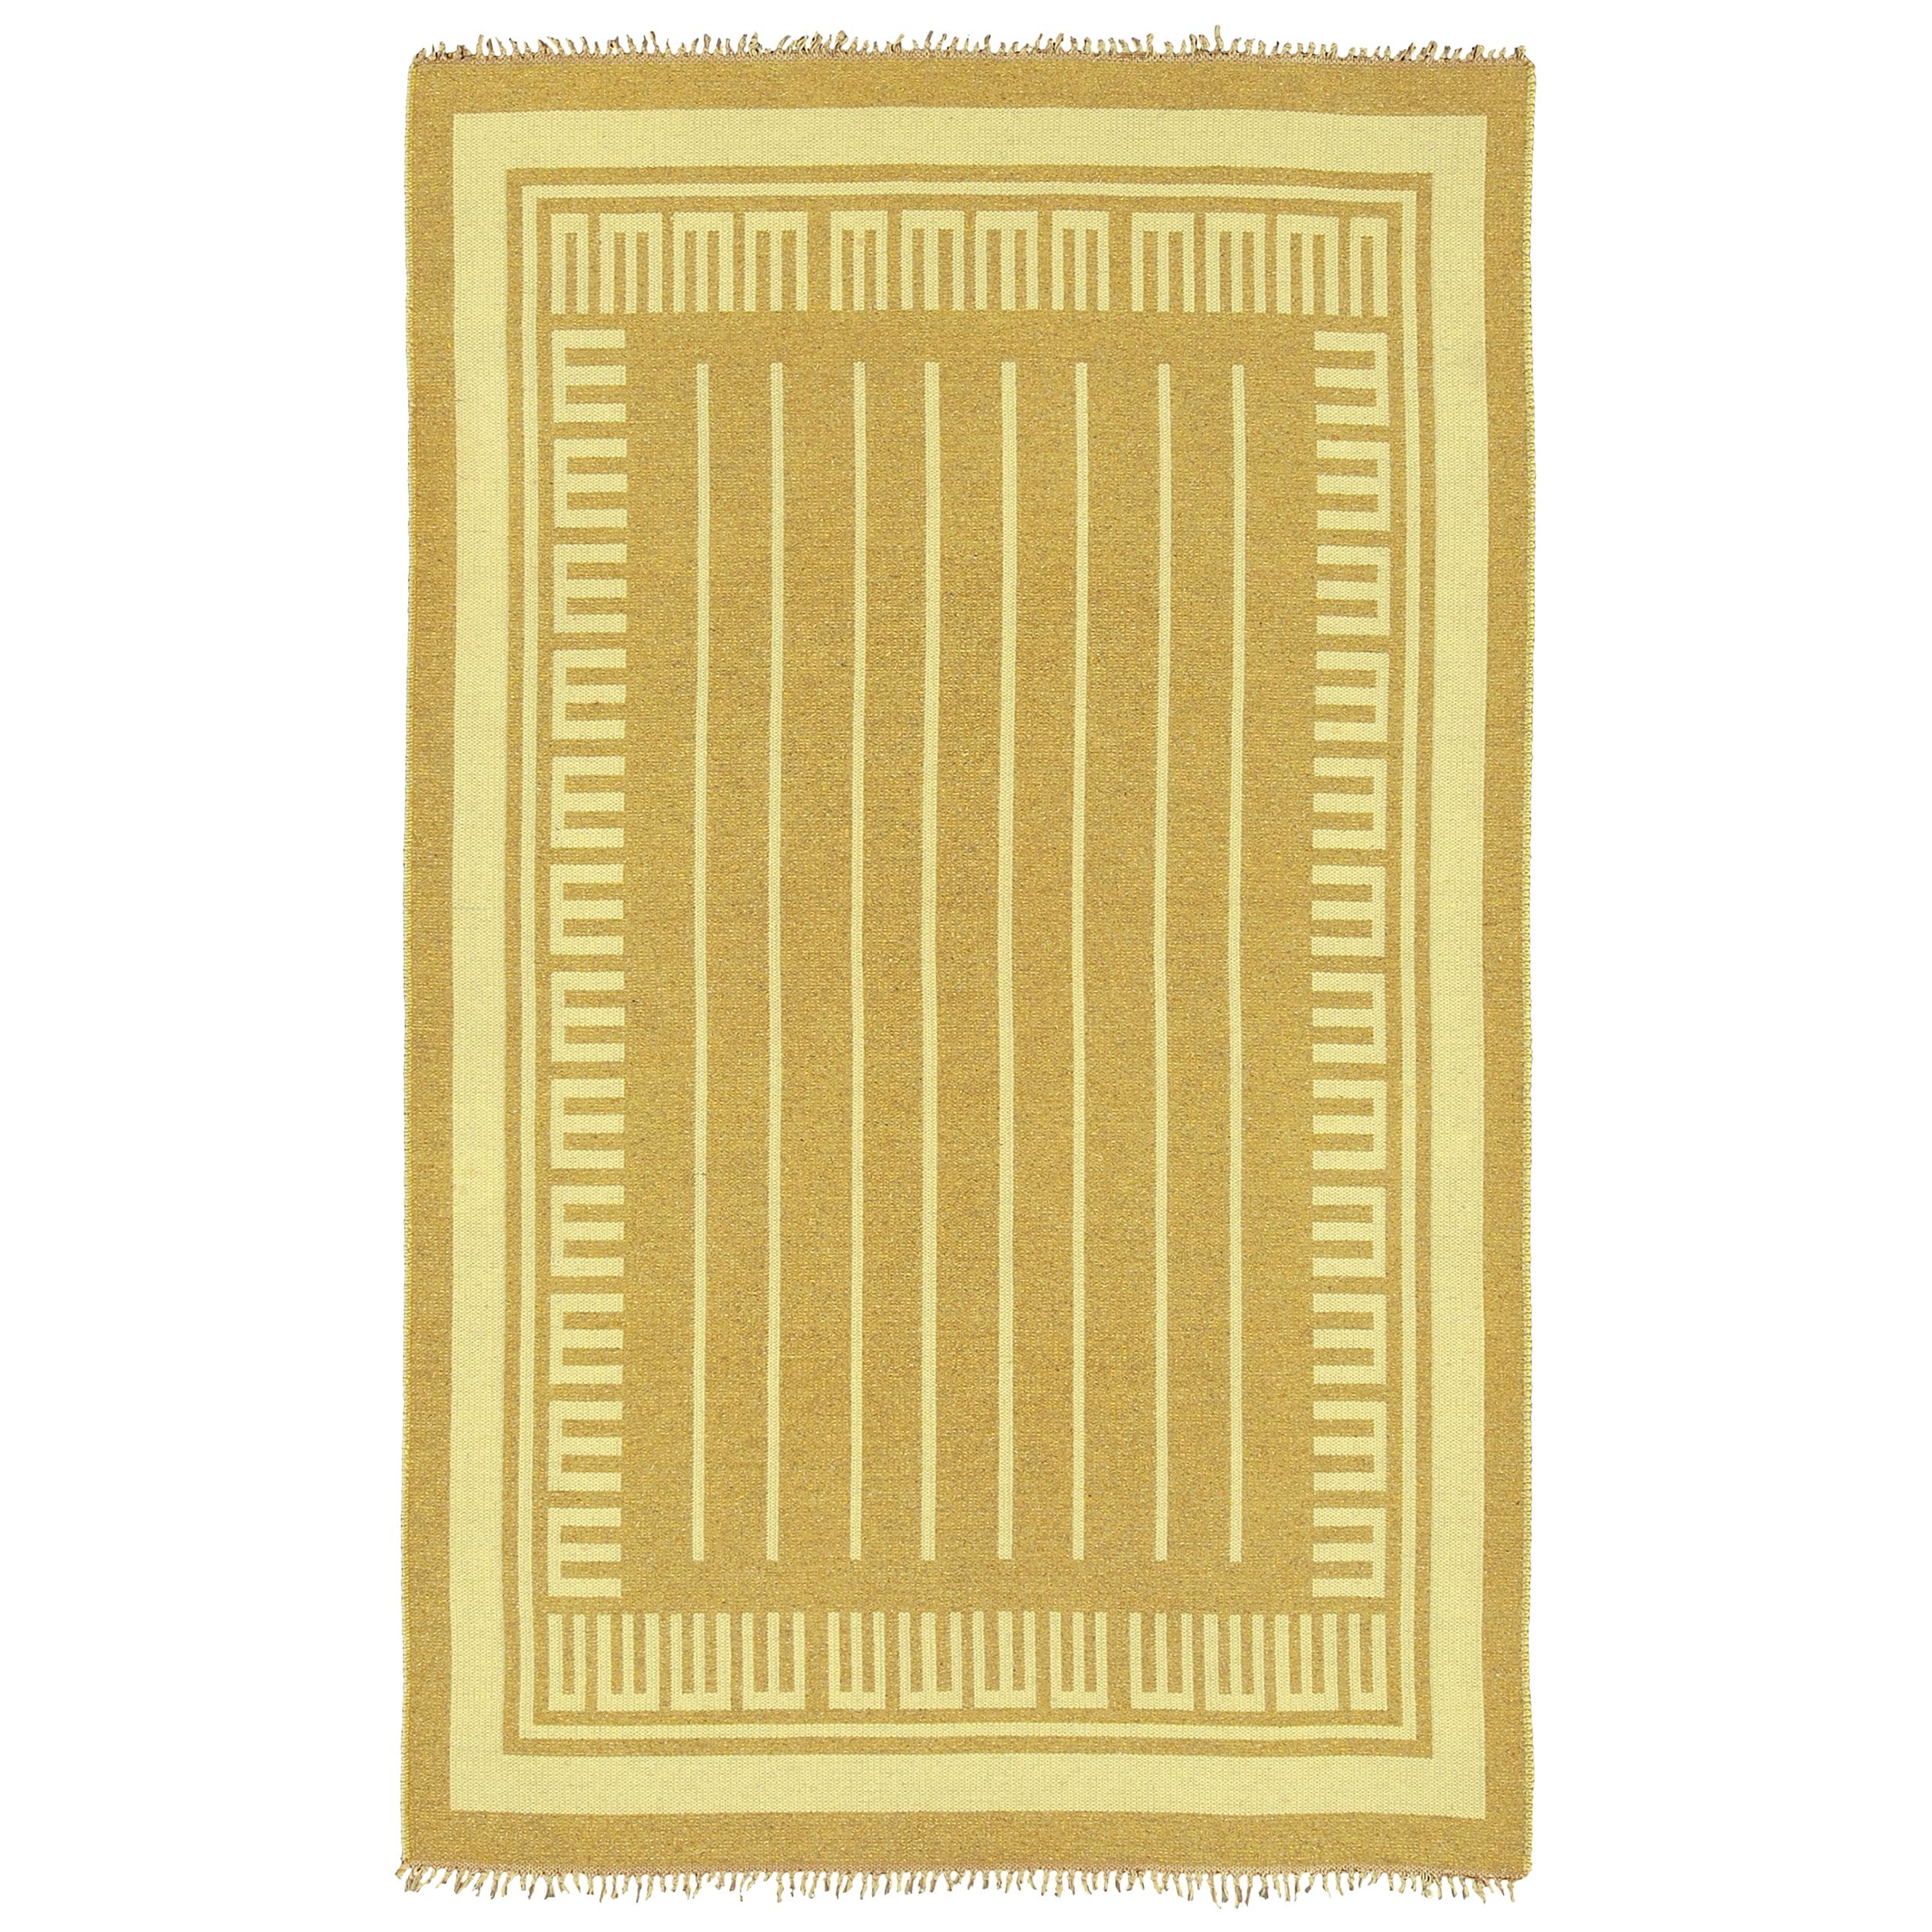 Mid 20th Century Swedish Flat-Weave Rug